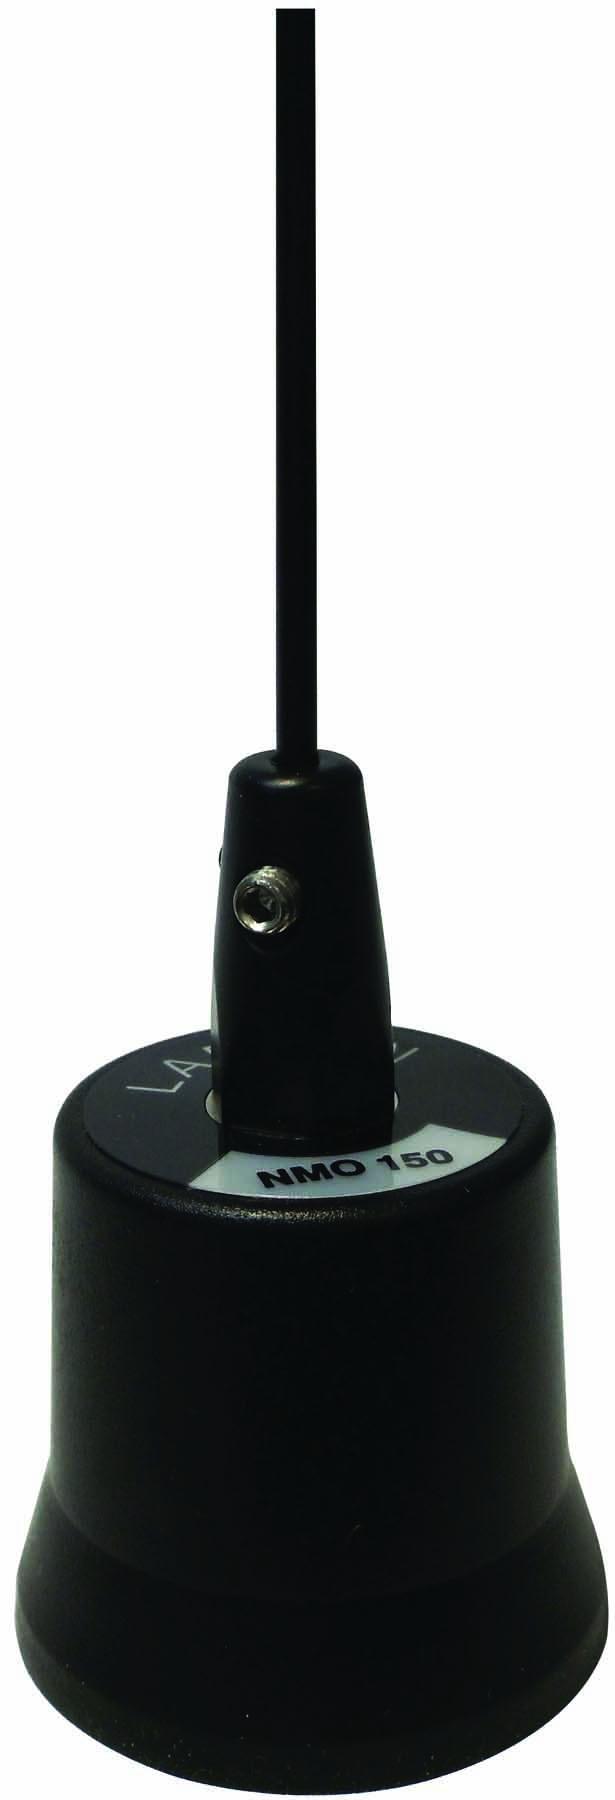 NMO150B - Larsen VHF Antenna 144-174 MHz